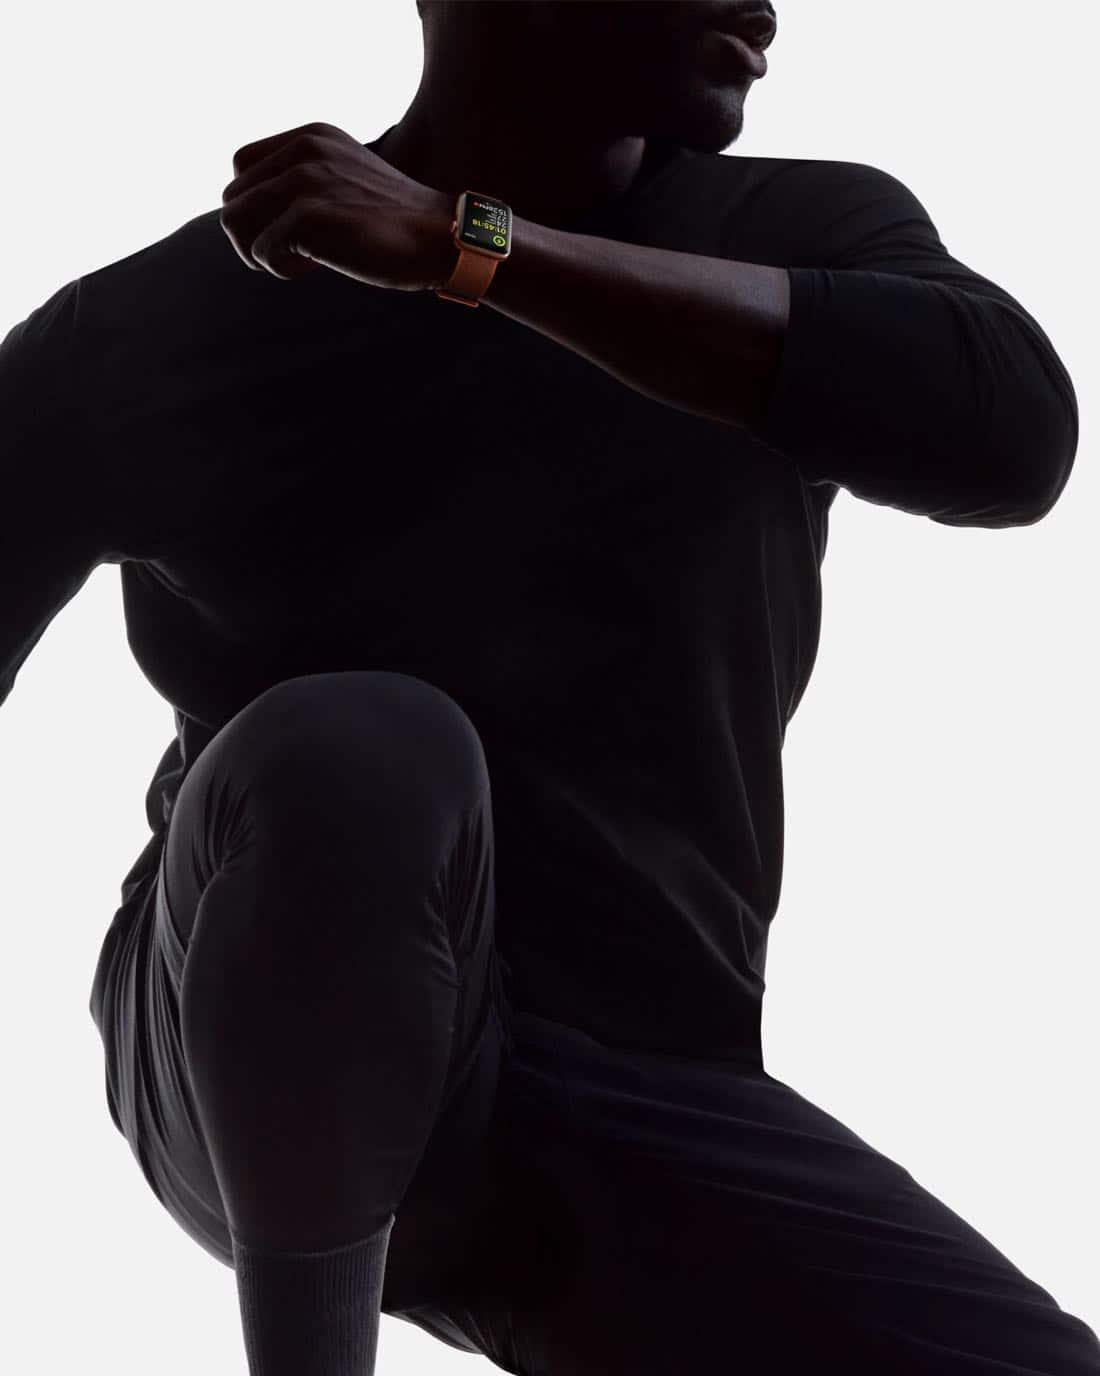 watch series 3 jump wrist